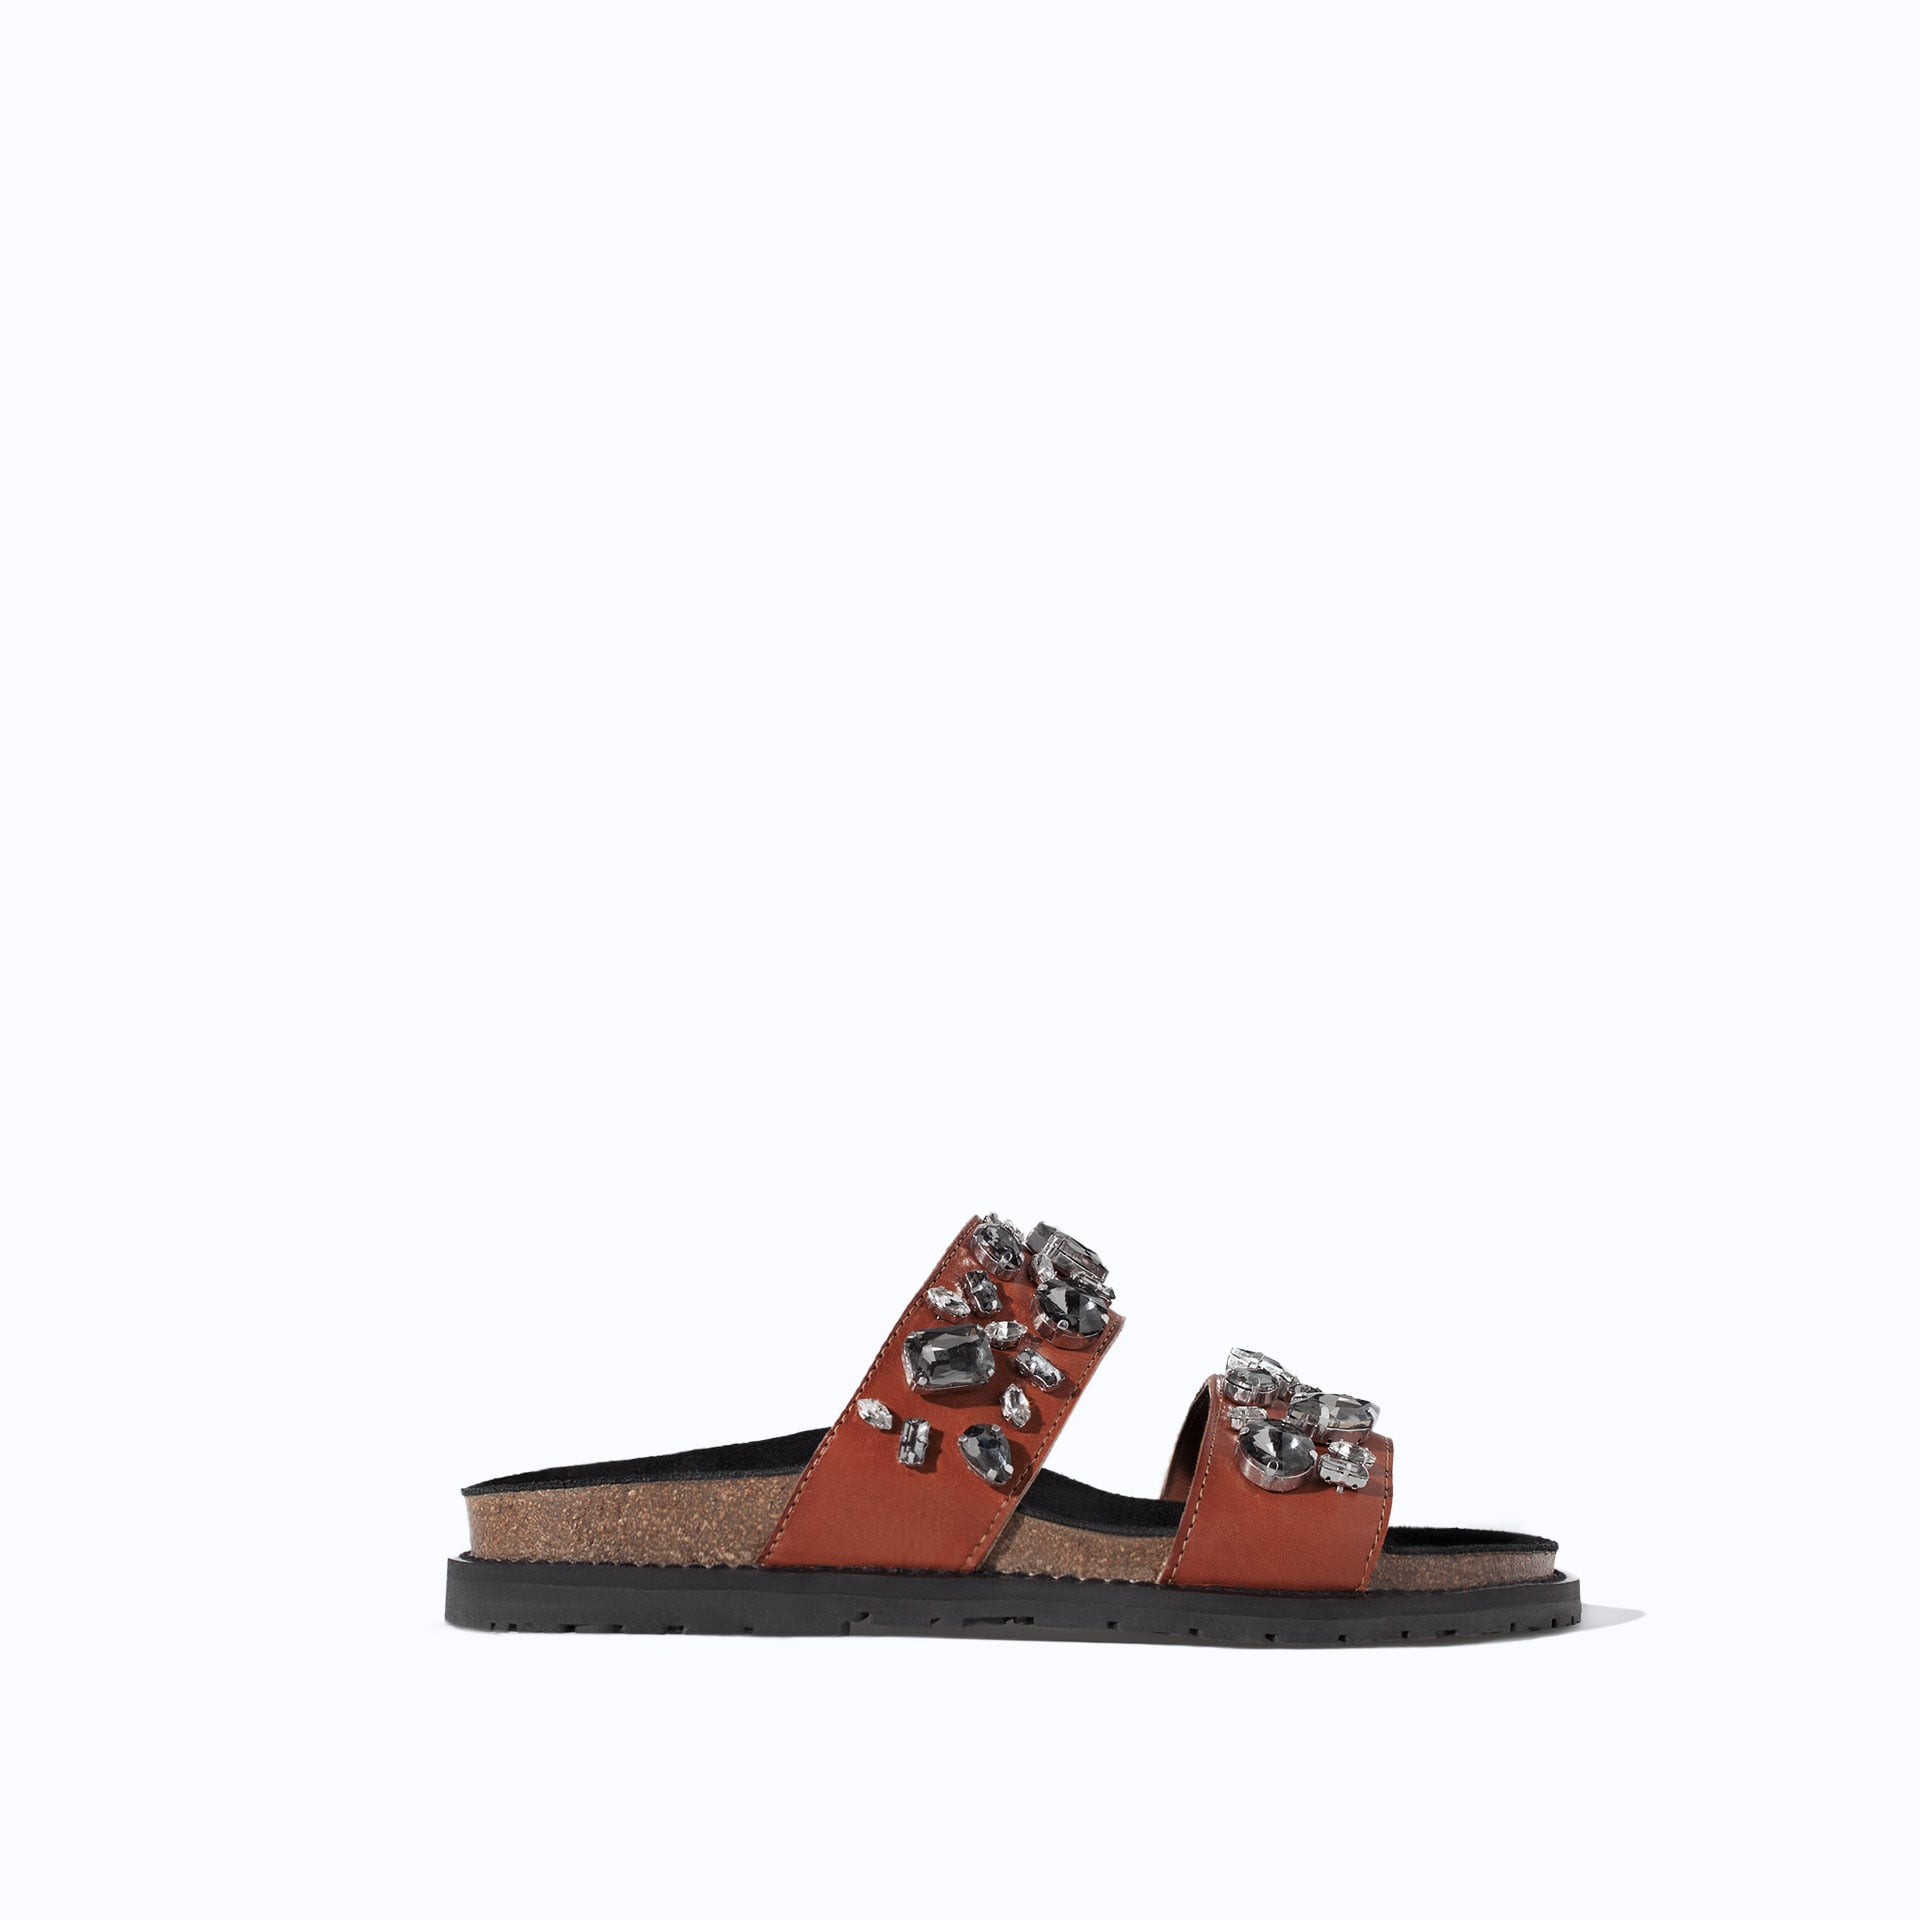 Zara Leather Jeweled Pool Slides ($100)